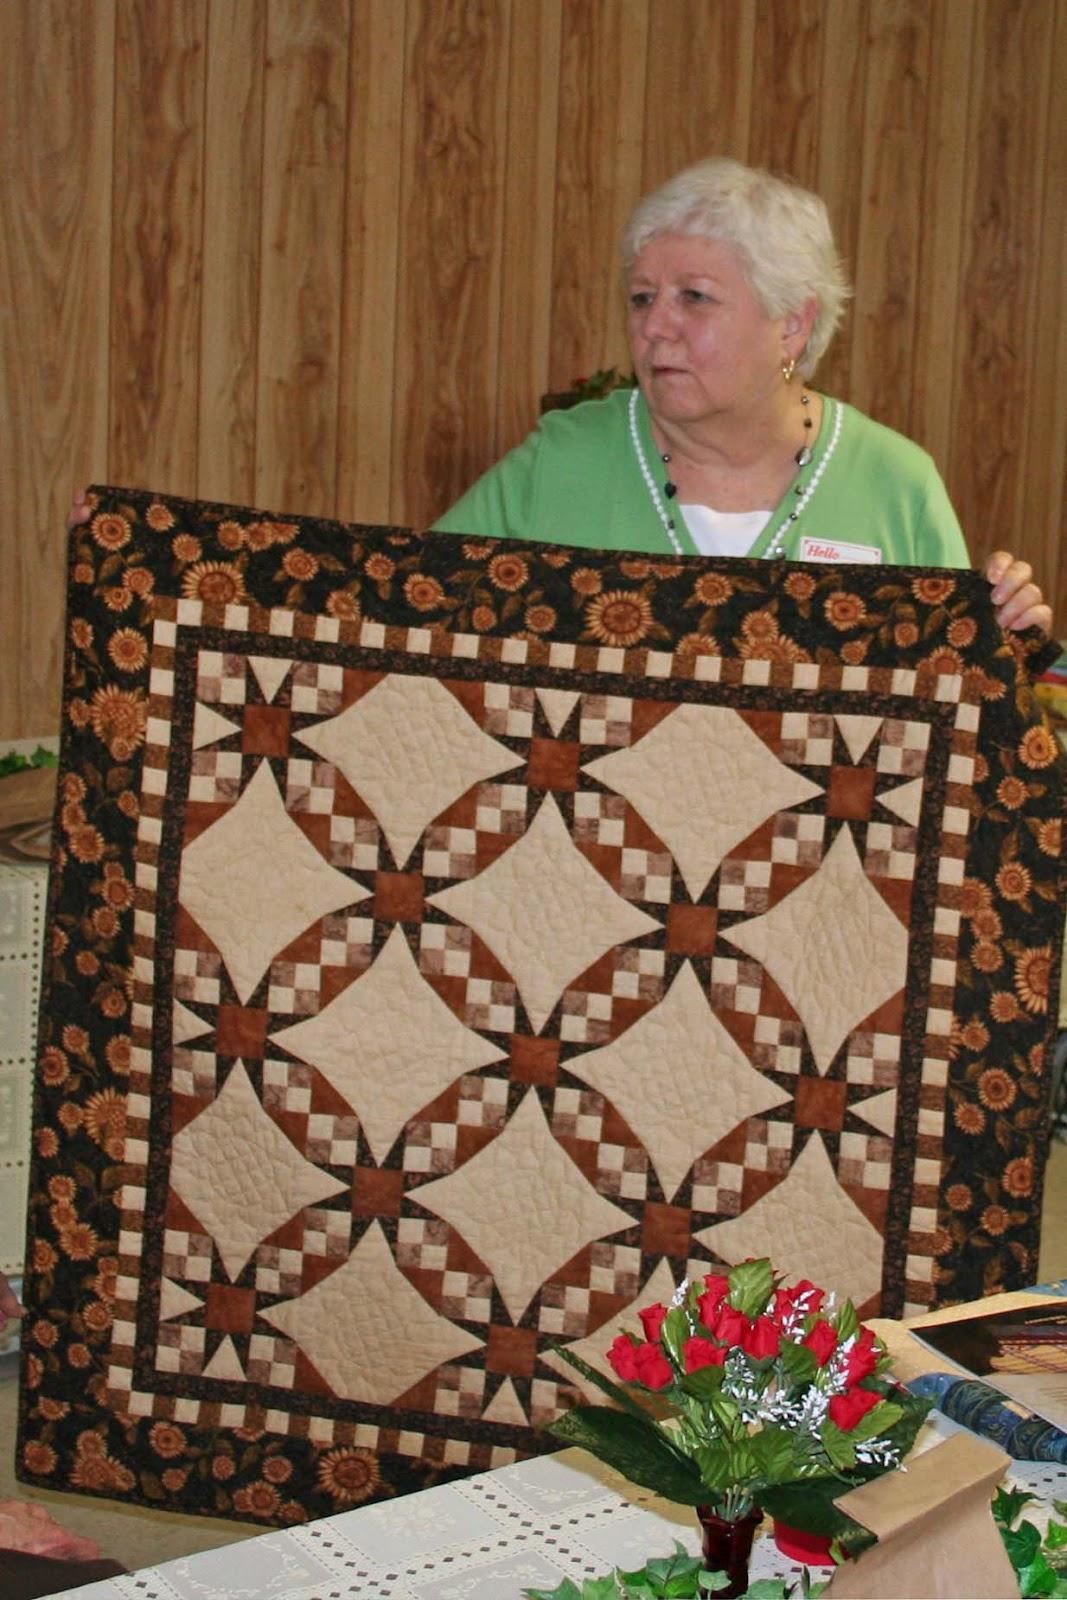 Wise County Quilt Guild Bridgeport, Texas: Quilting Project Going ... : texas quilt guilds - Adamdwight.com